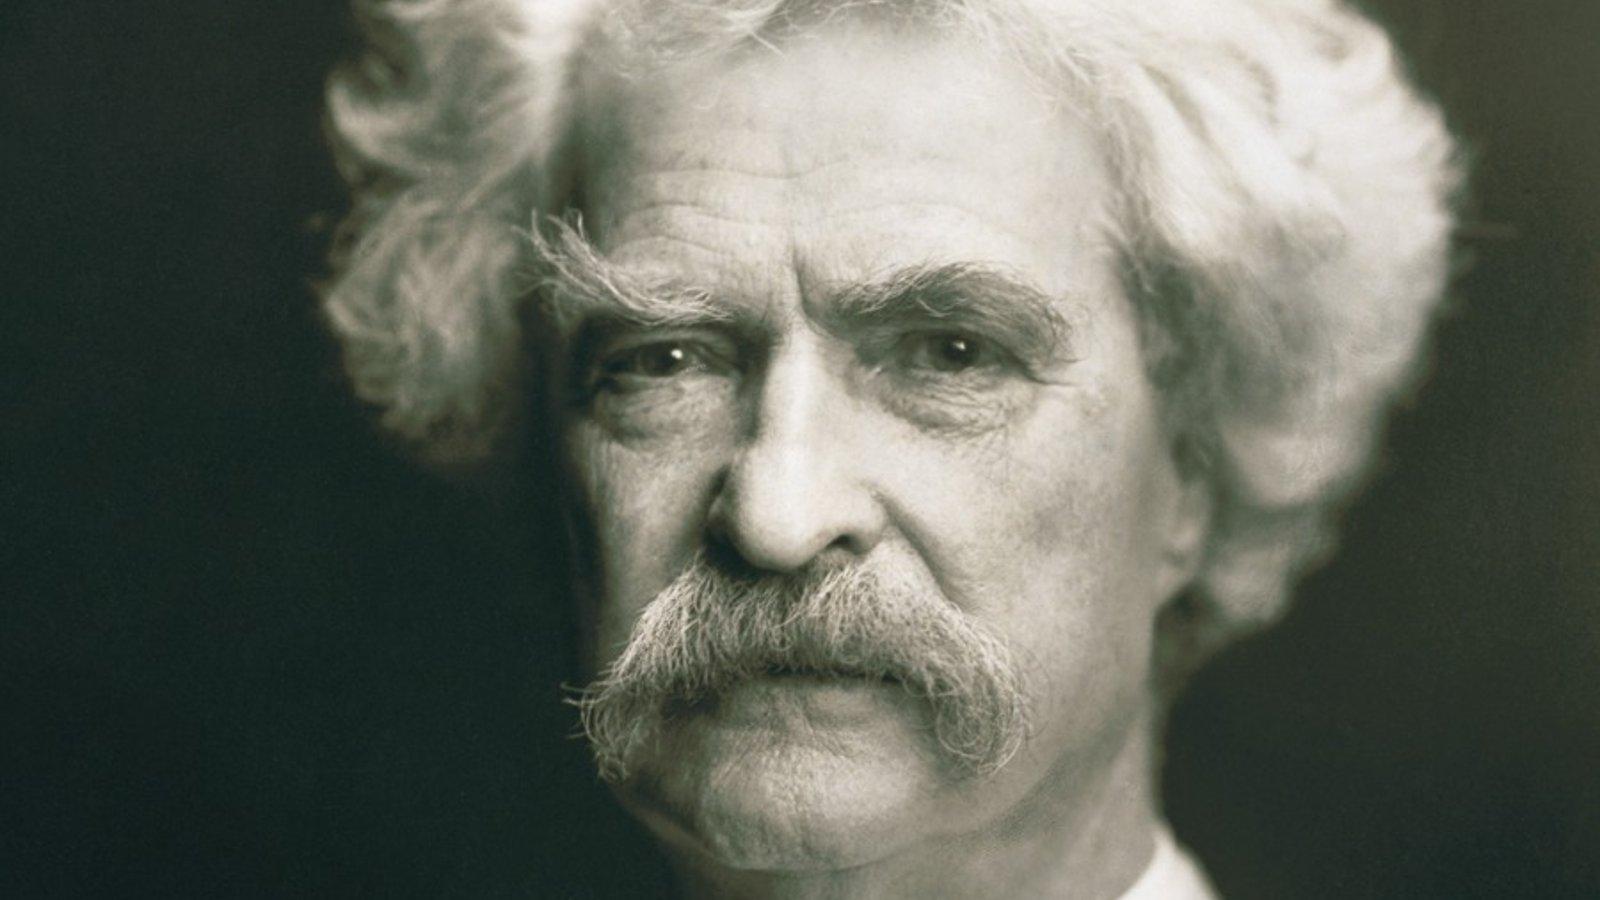 Ken Burns: Mark Twain - Part 1